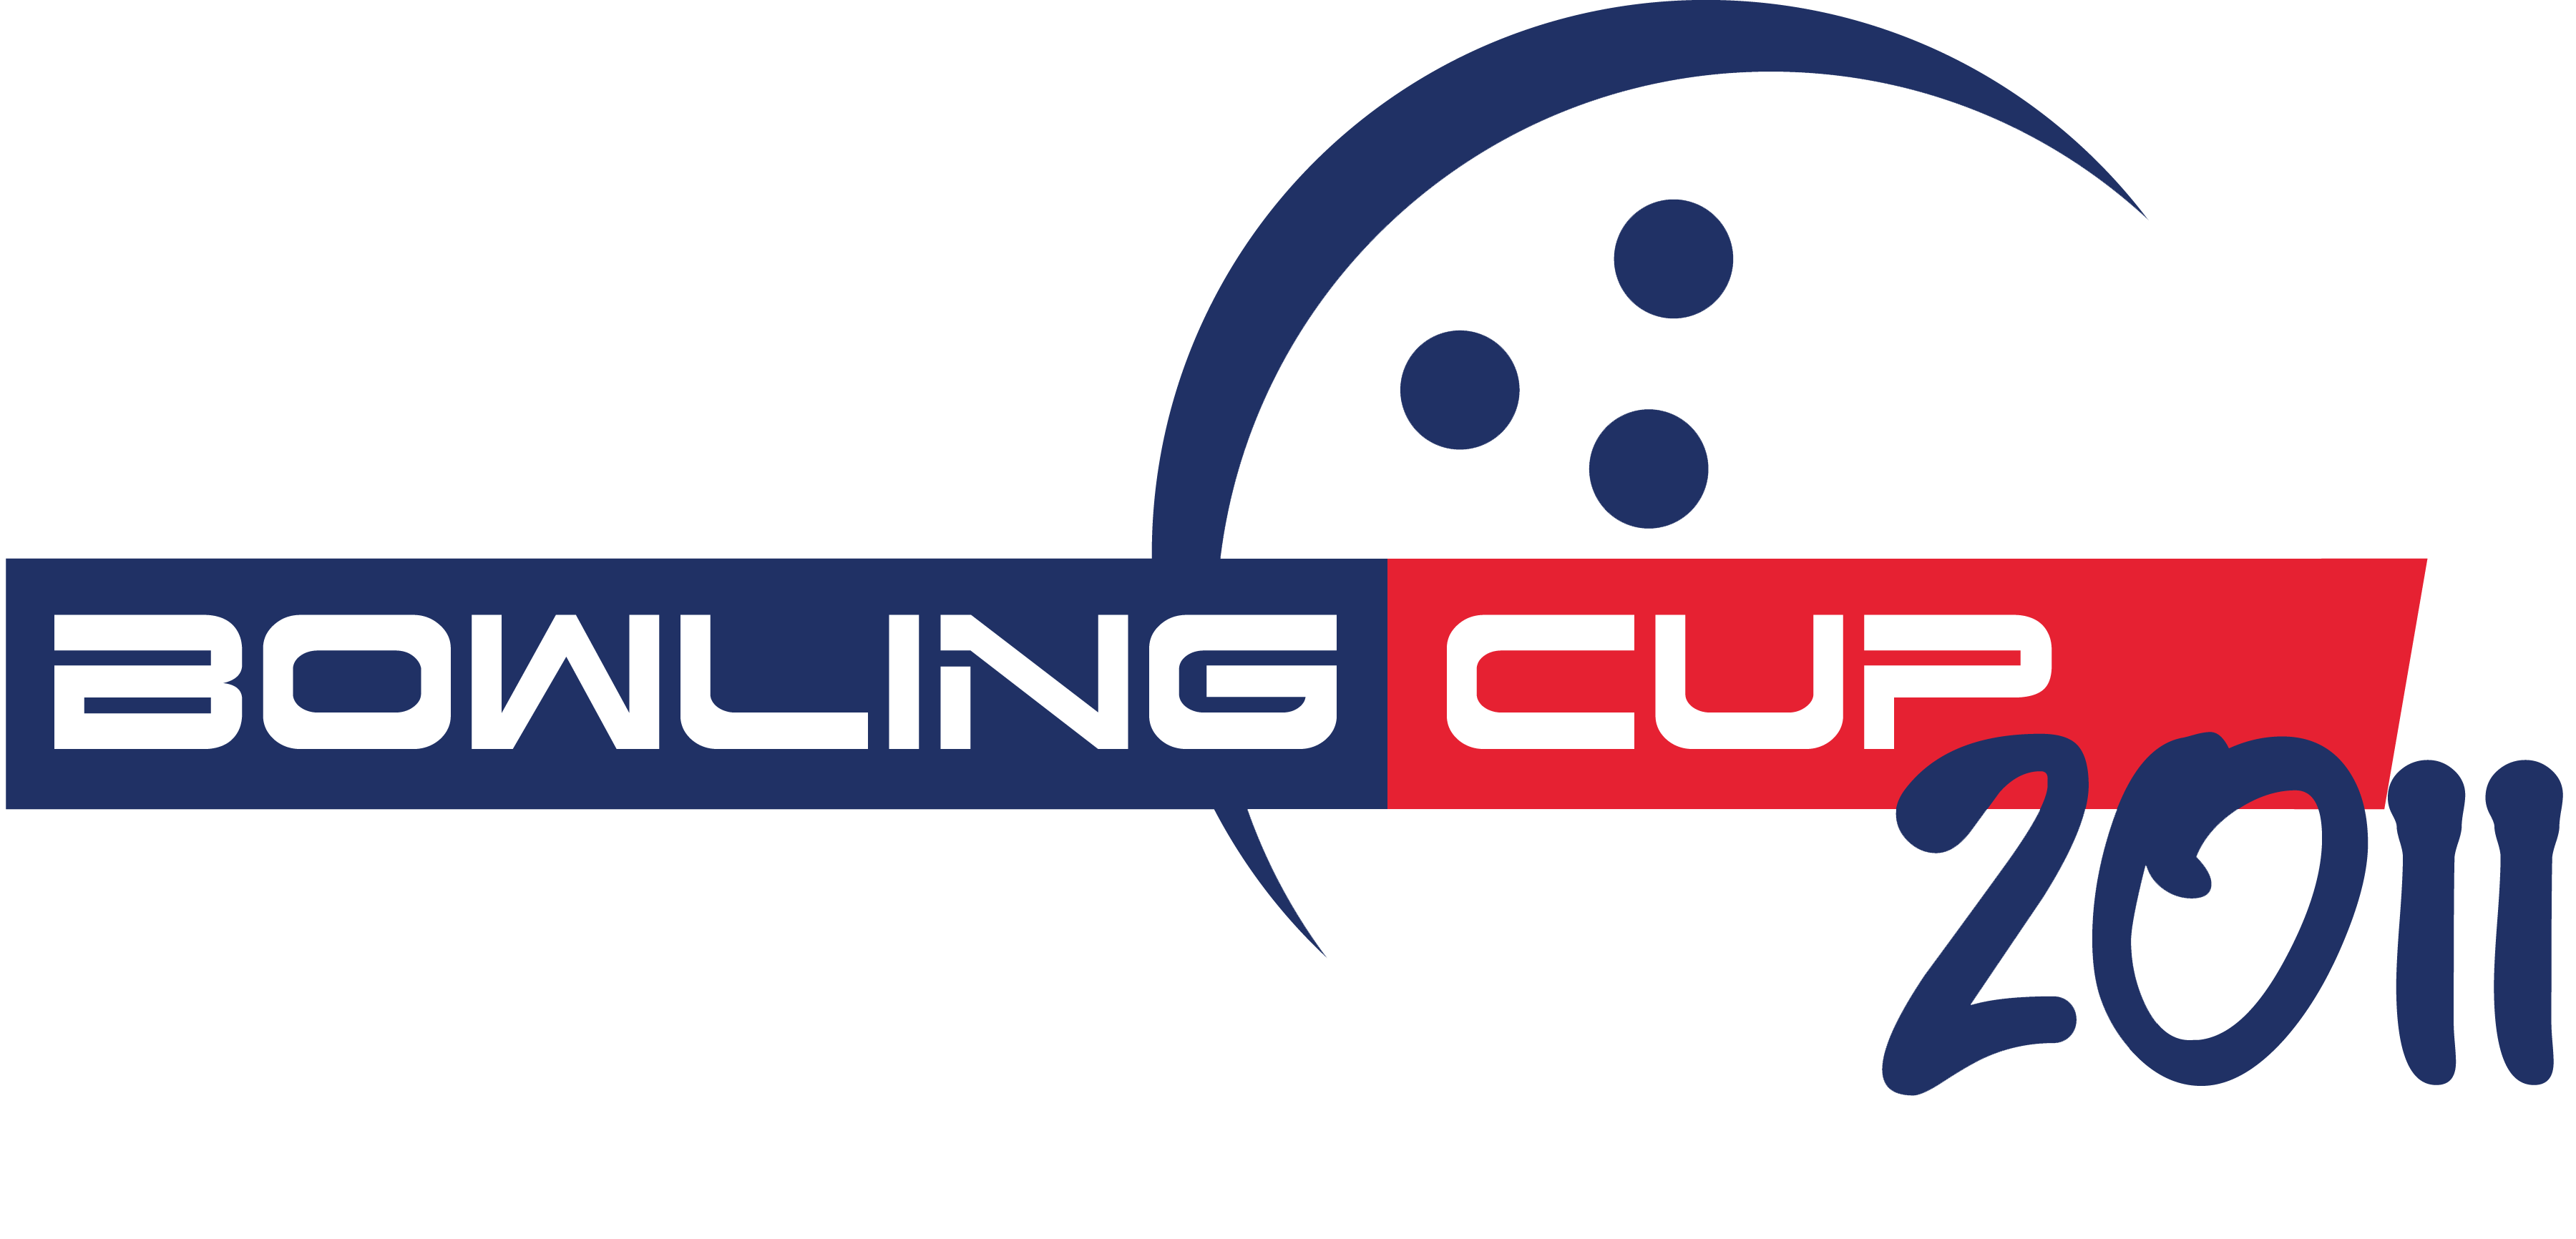 Bowling Logo Stock Images RoyaltyFree Images amp Vectors